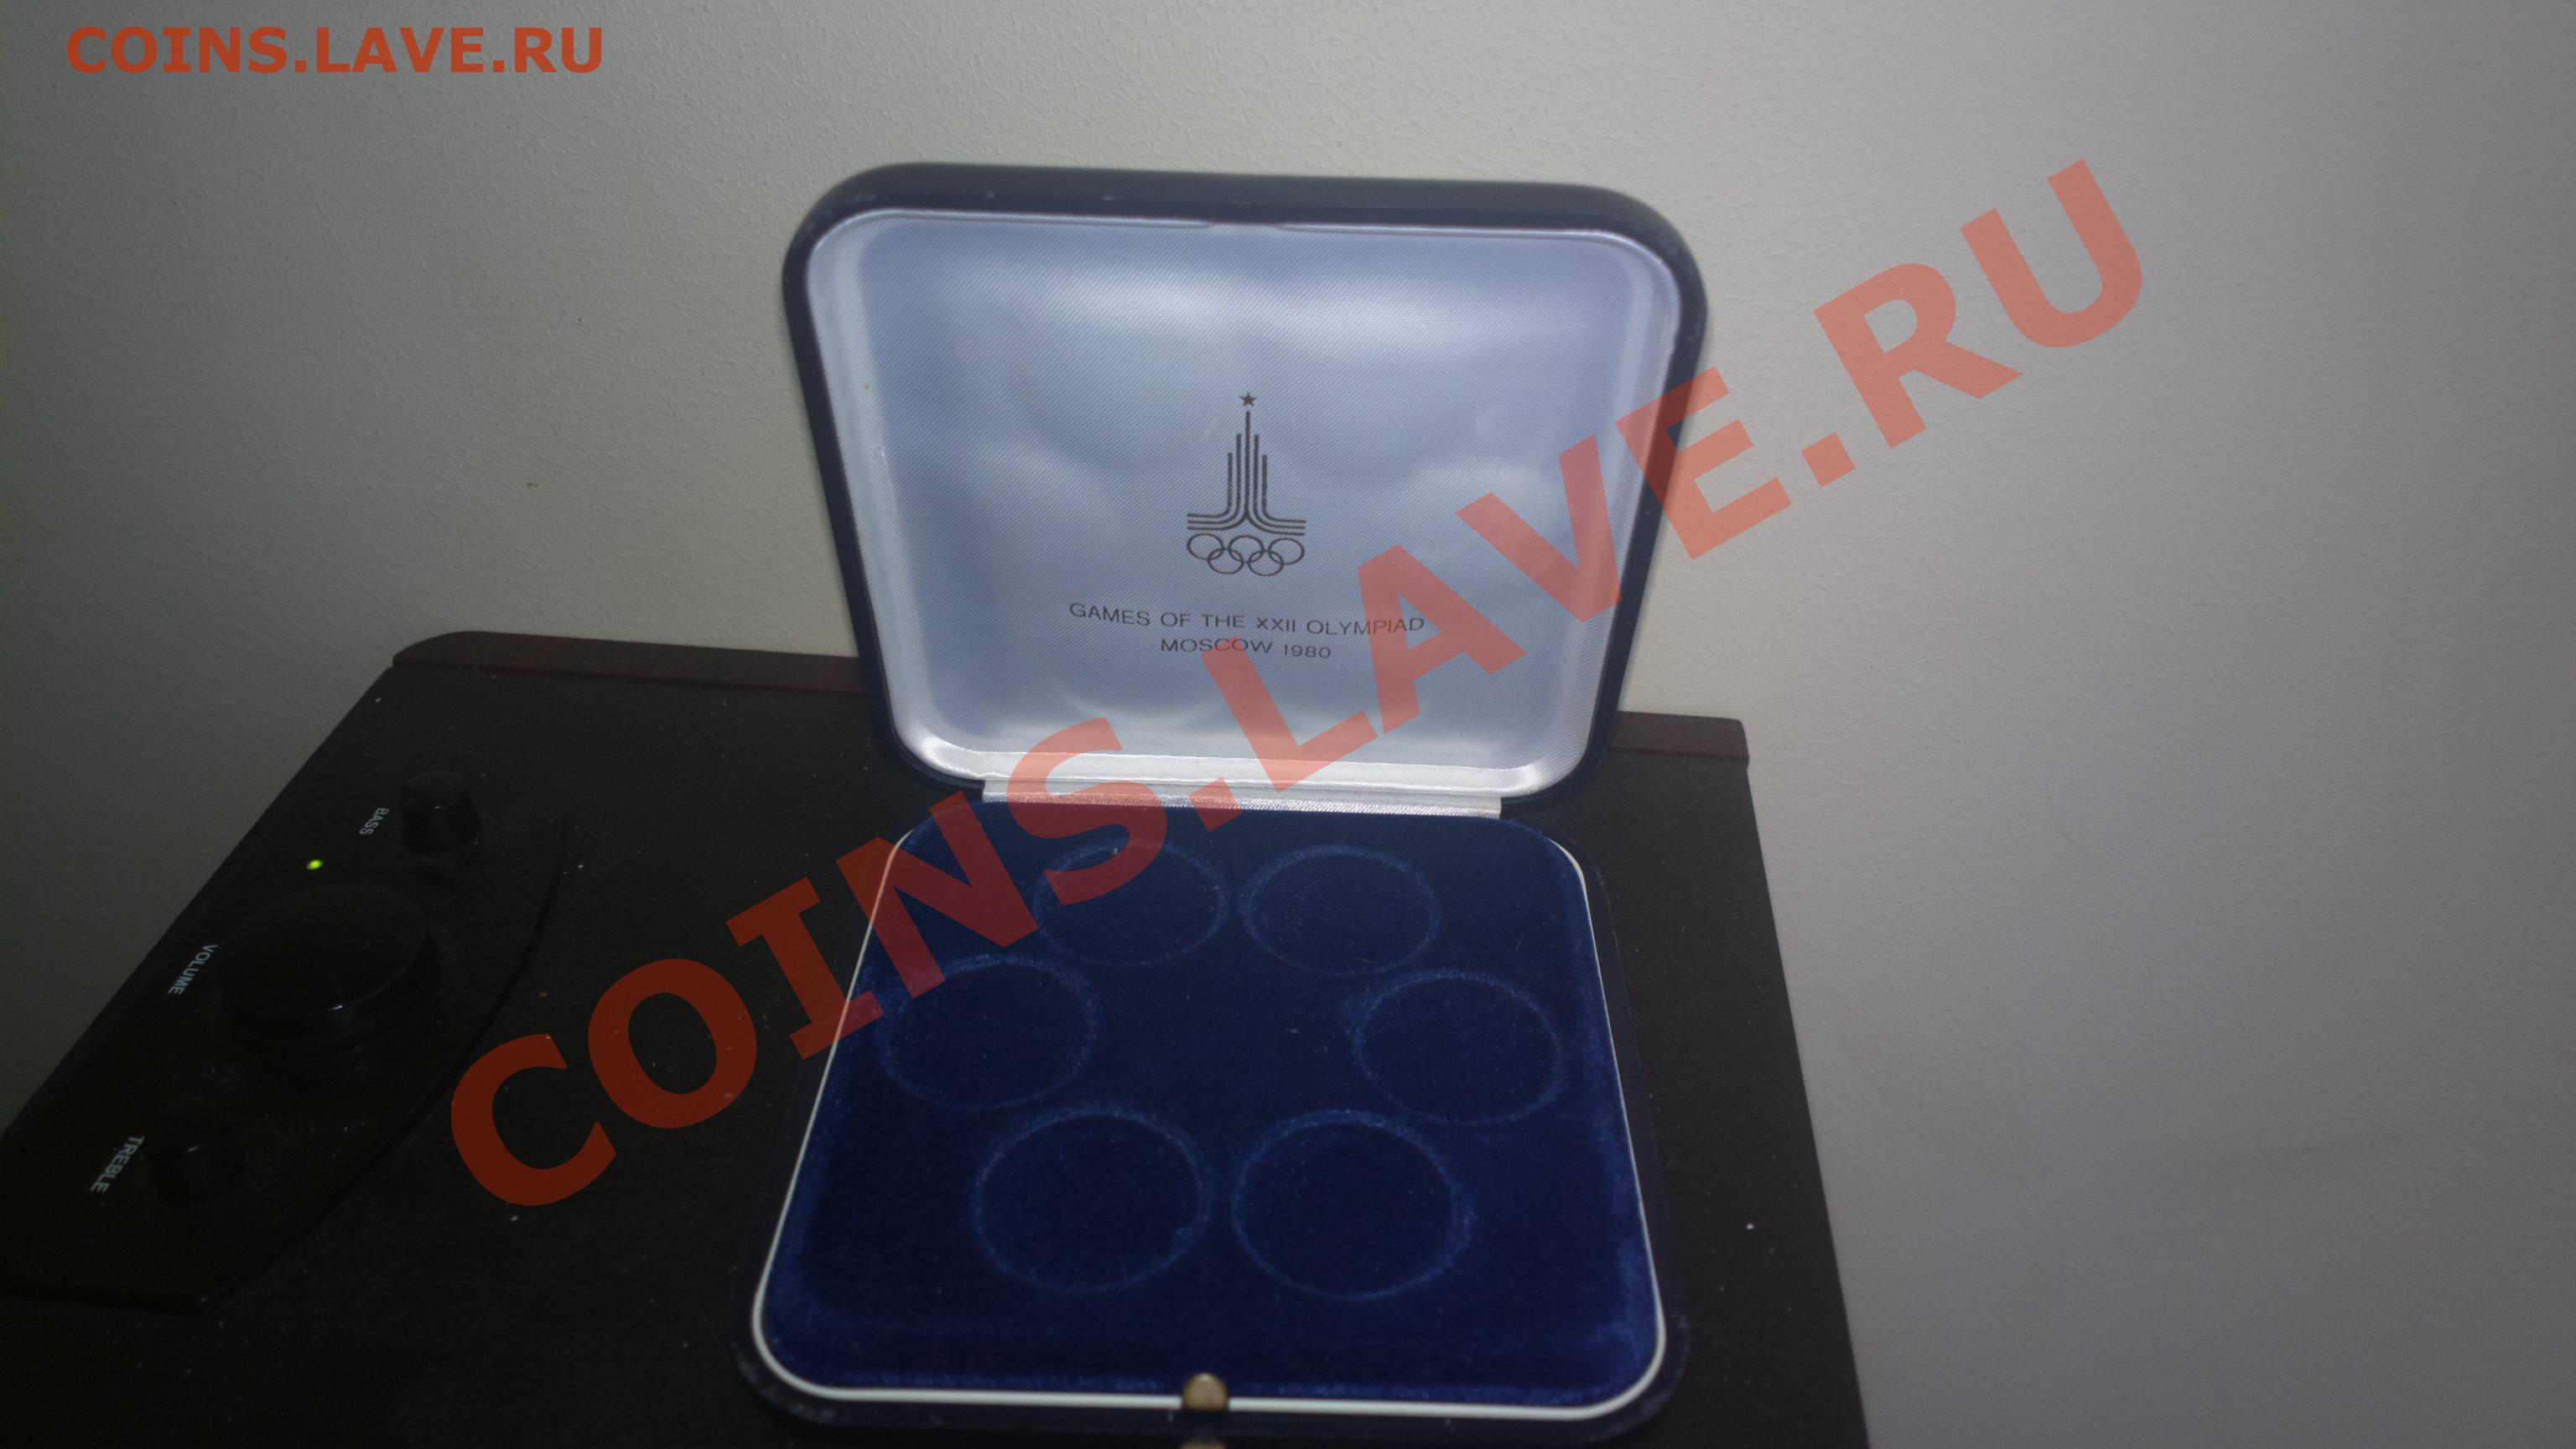 Коробка для монет олимпиада 80 3 копейки 1986 года стоимость